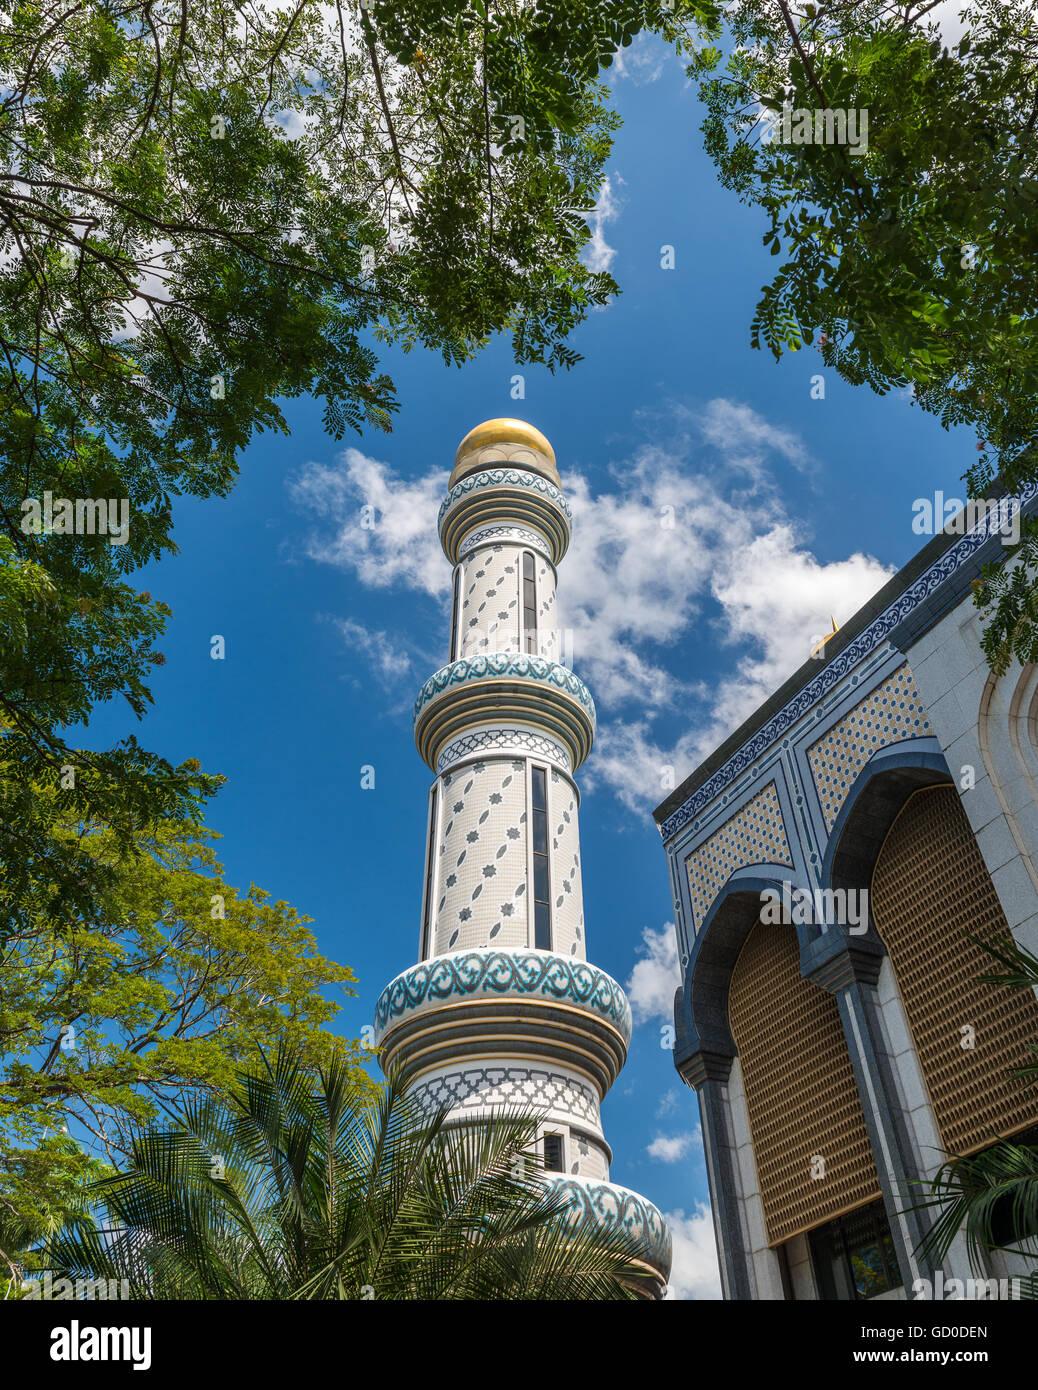 Jame'ASR Hassanil Bolkiah moschea in Bandar Seri Begawan, Brunei. Immagini Stock